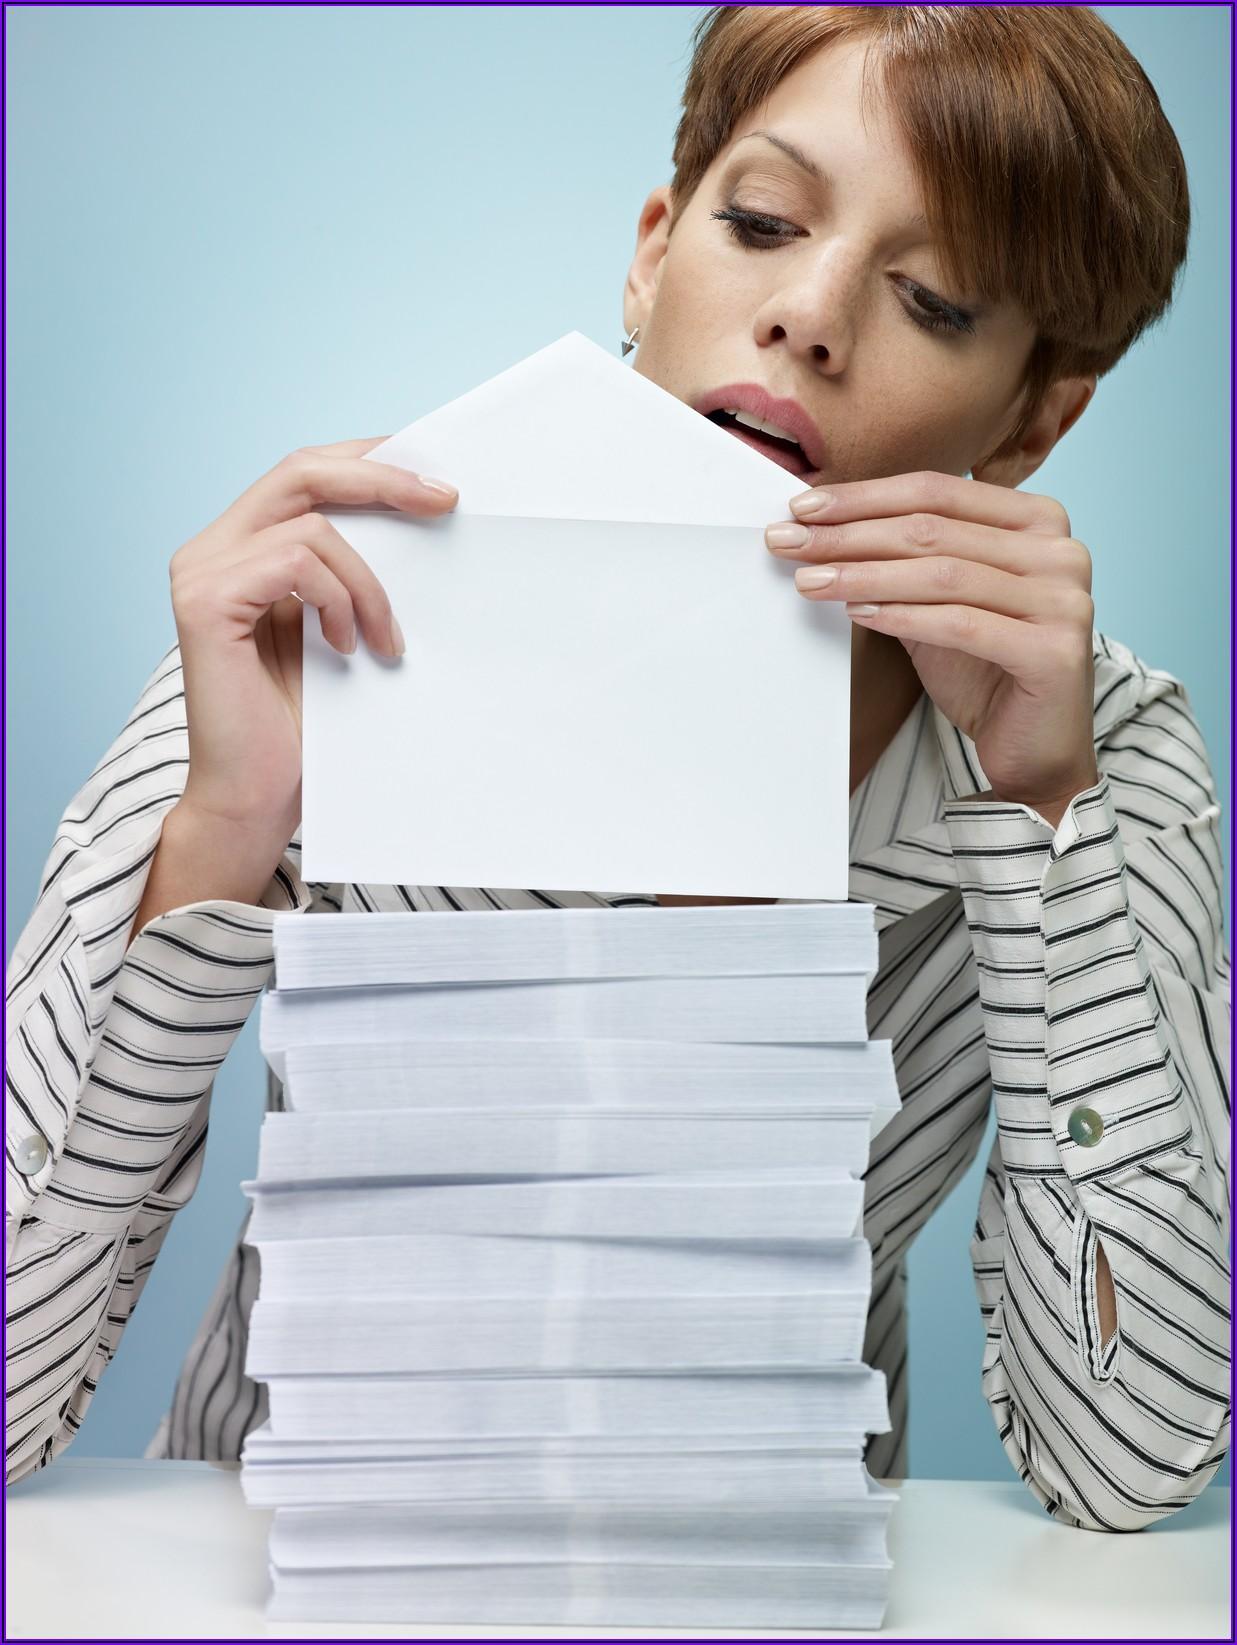 Is Stuffing Envelopes At Home Job Legitimate